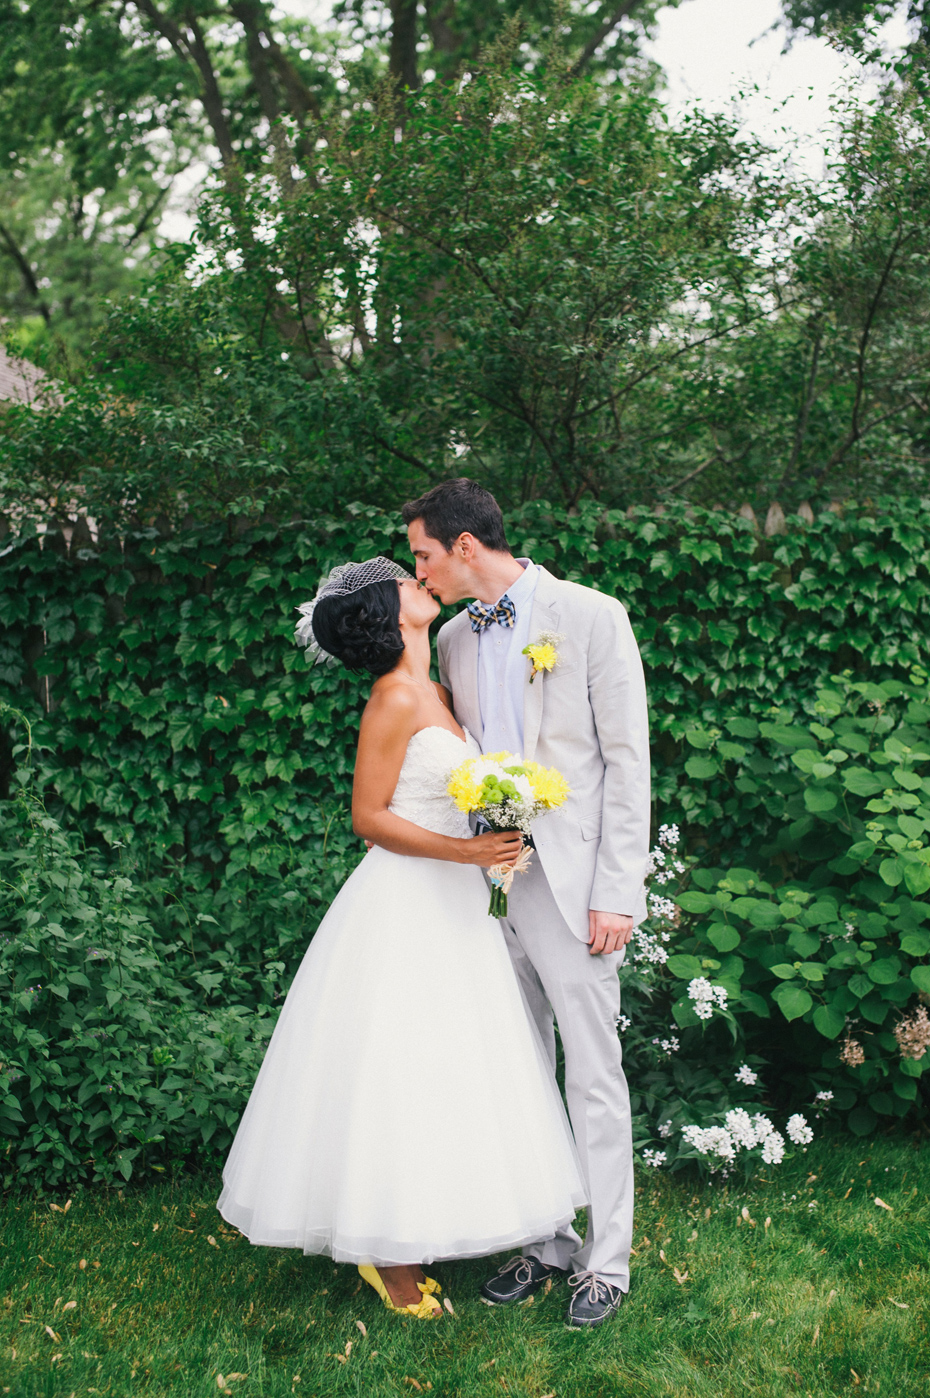 Arya and brett 39 s backyard wedding in kalamazoo detroit for Wedding dresses in kalamazoo mi